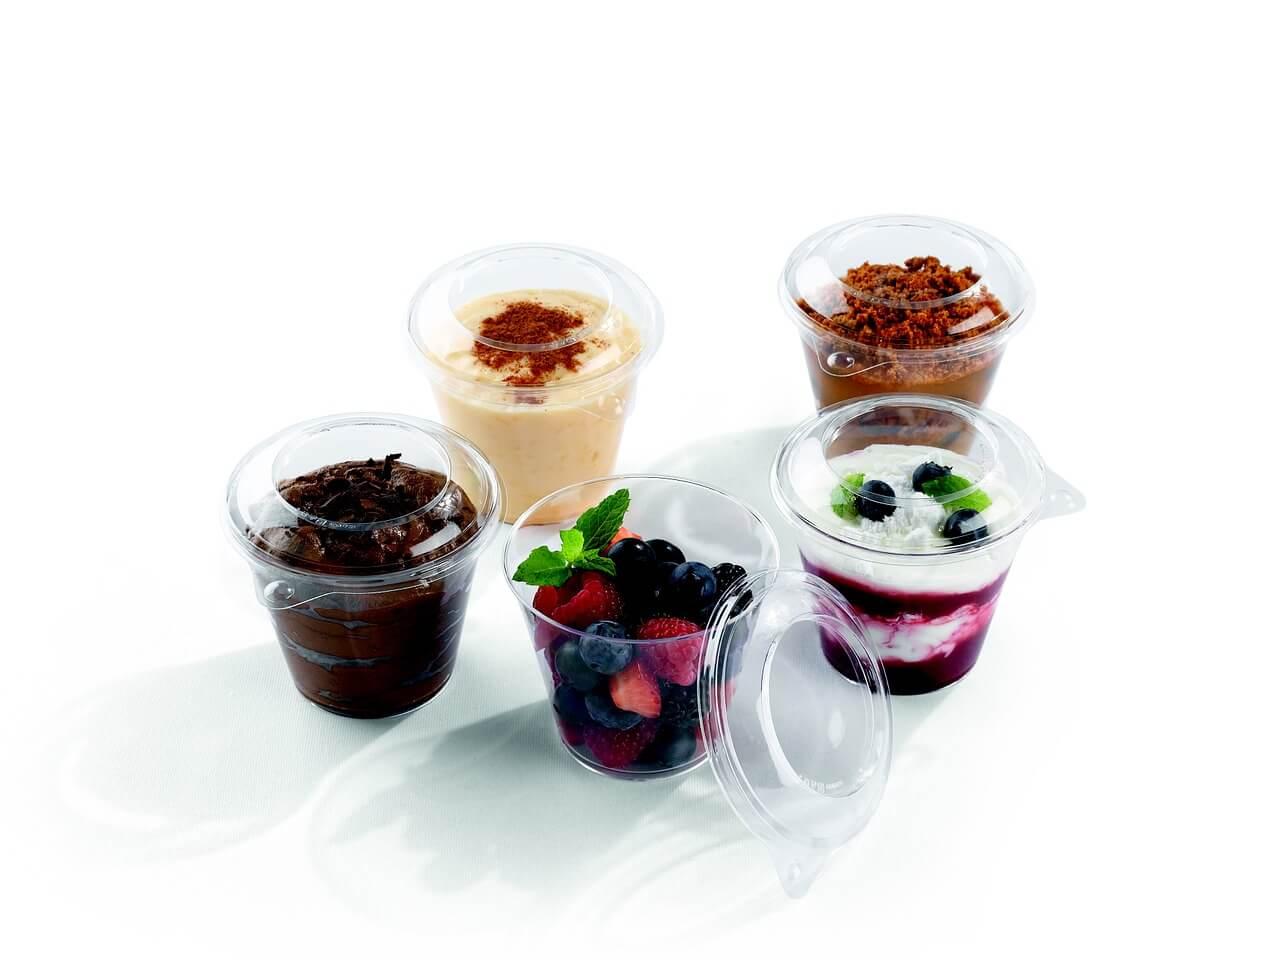 The Buyers Guide To Choosing The Best Yogurt Maker Top 6 Reviews